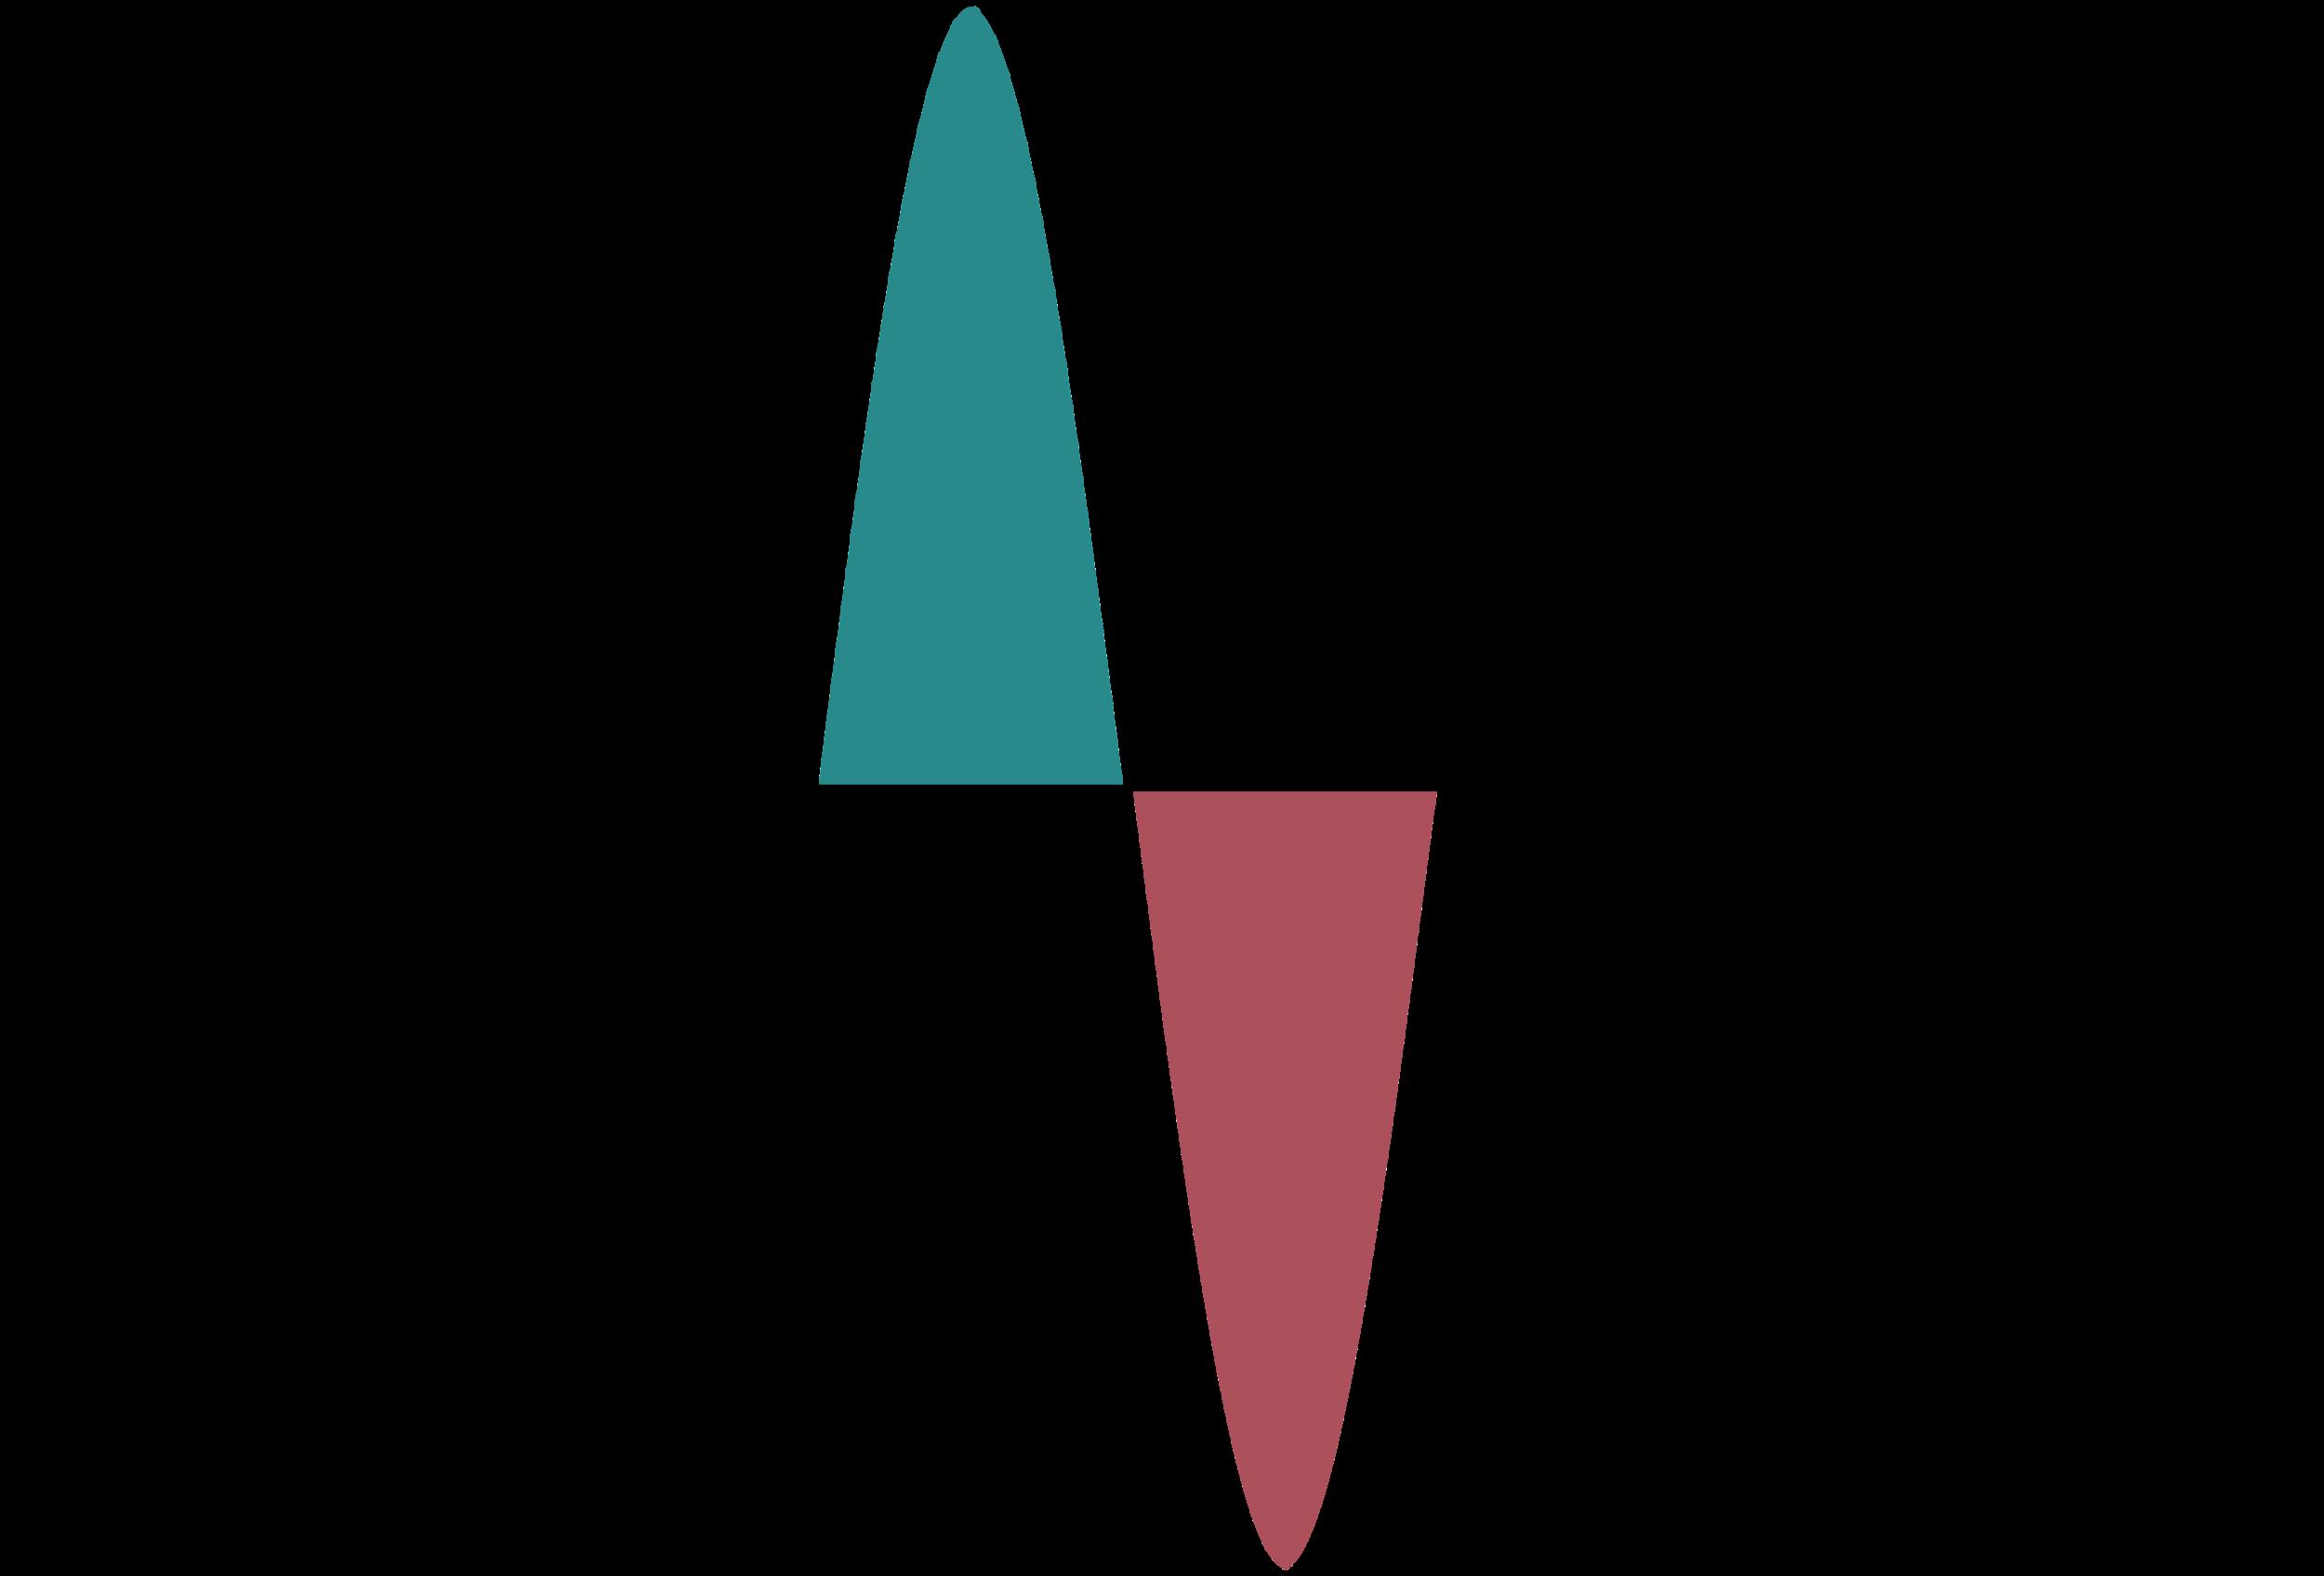 Zero-cross control waveform